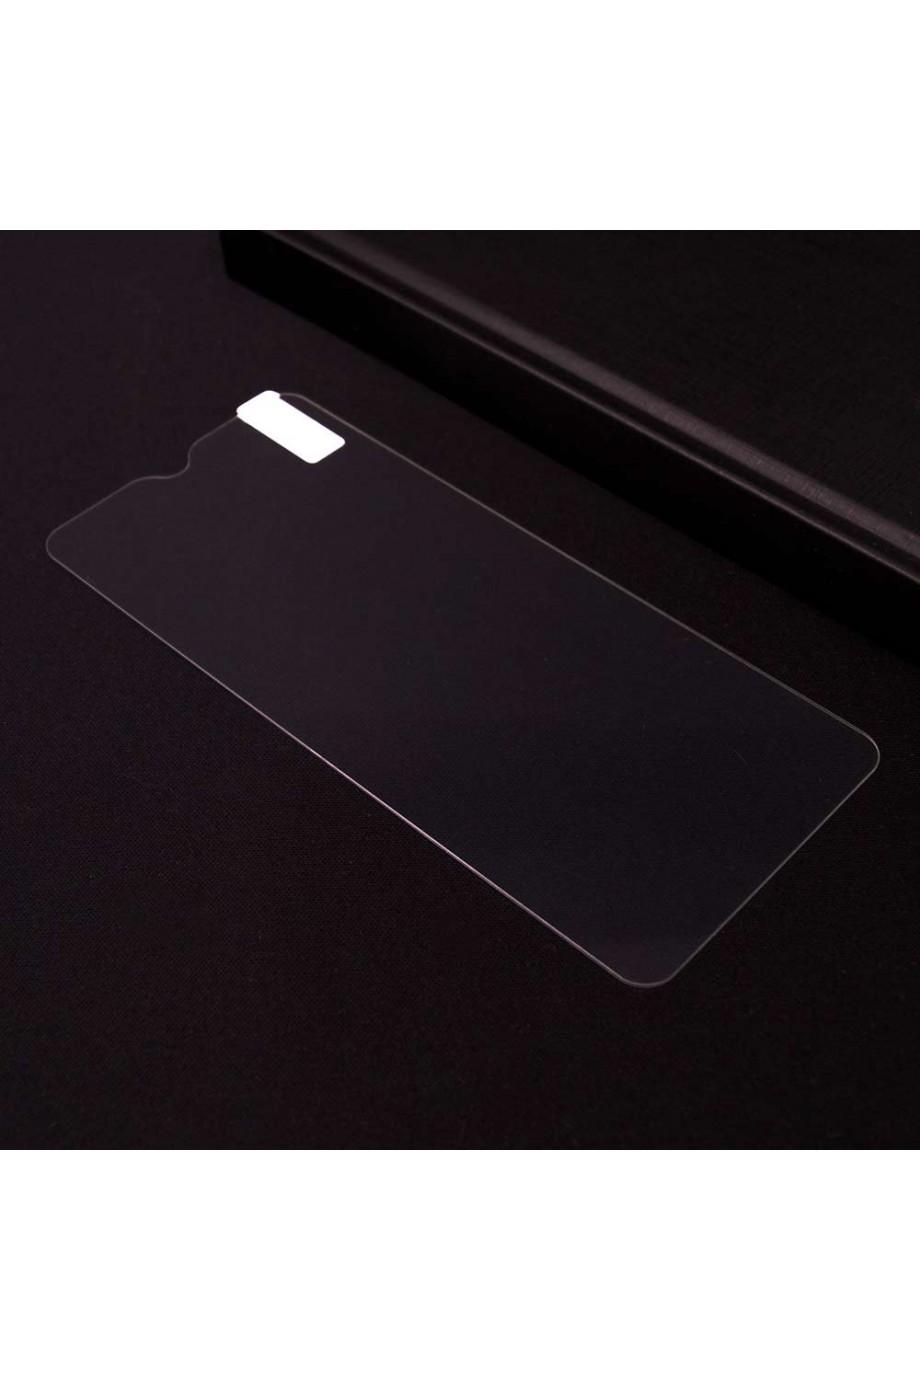 Защитное стекло Mikomo для Xiaomi Redmi Note 7 Pro